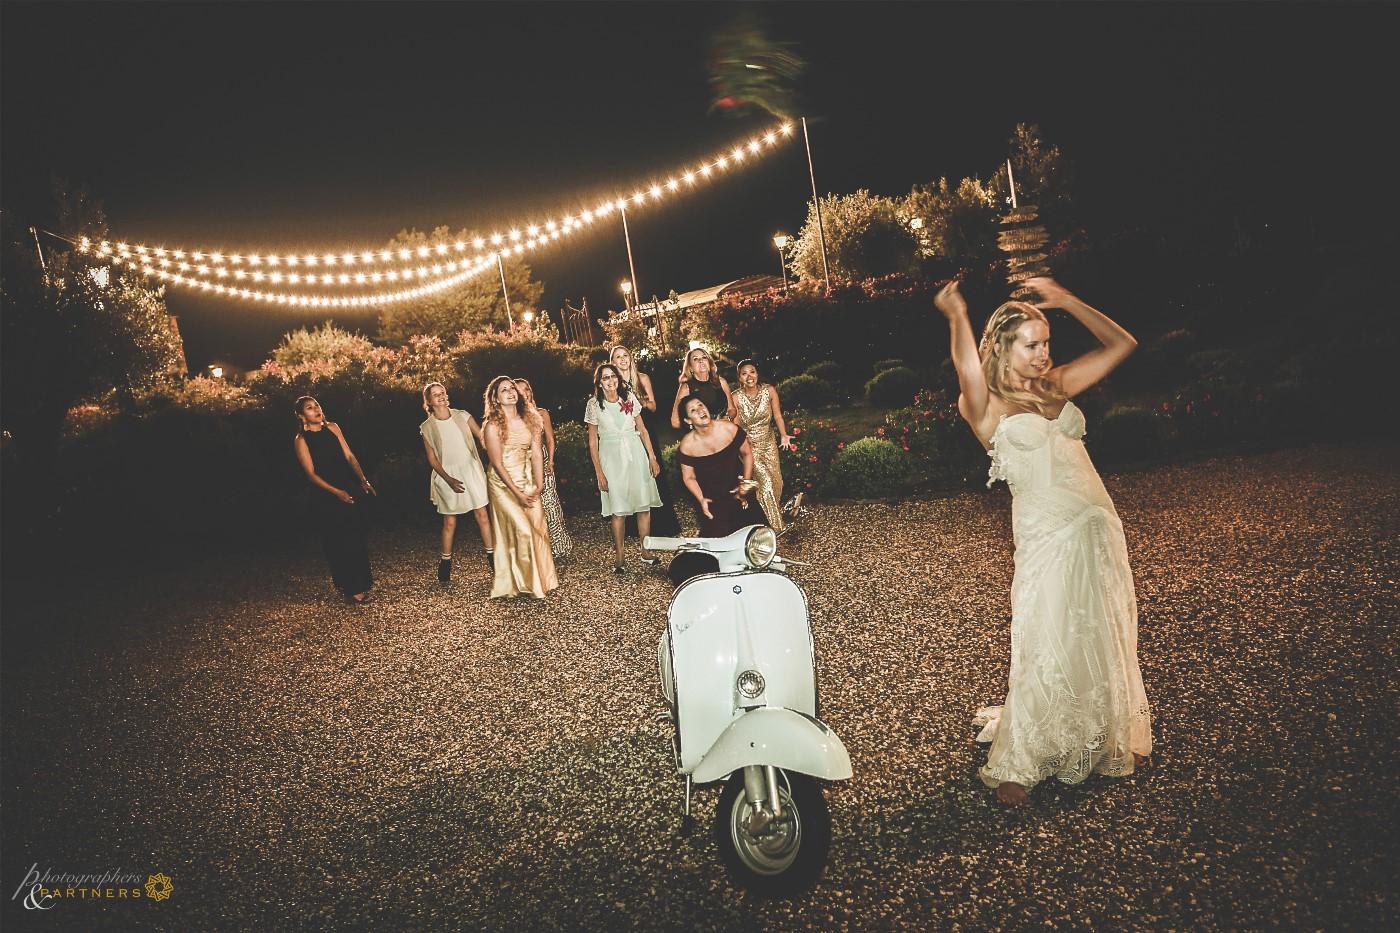 photographers_weddings_italy_21.jpg